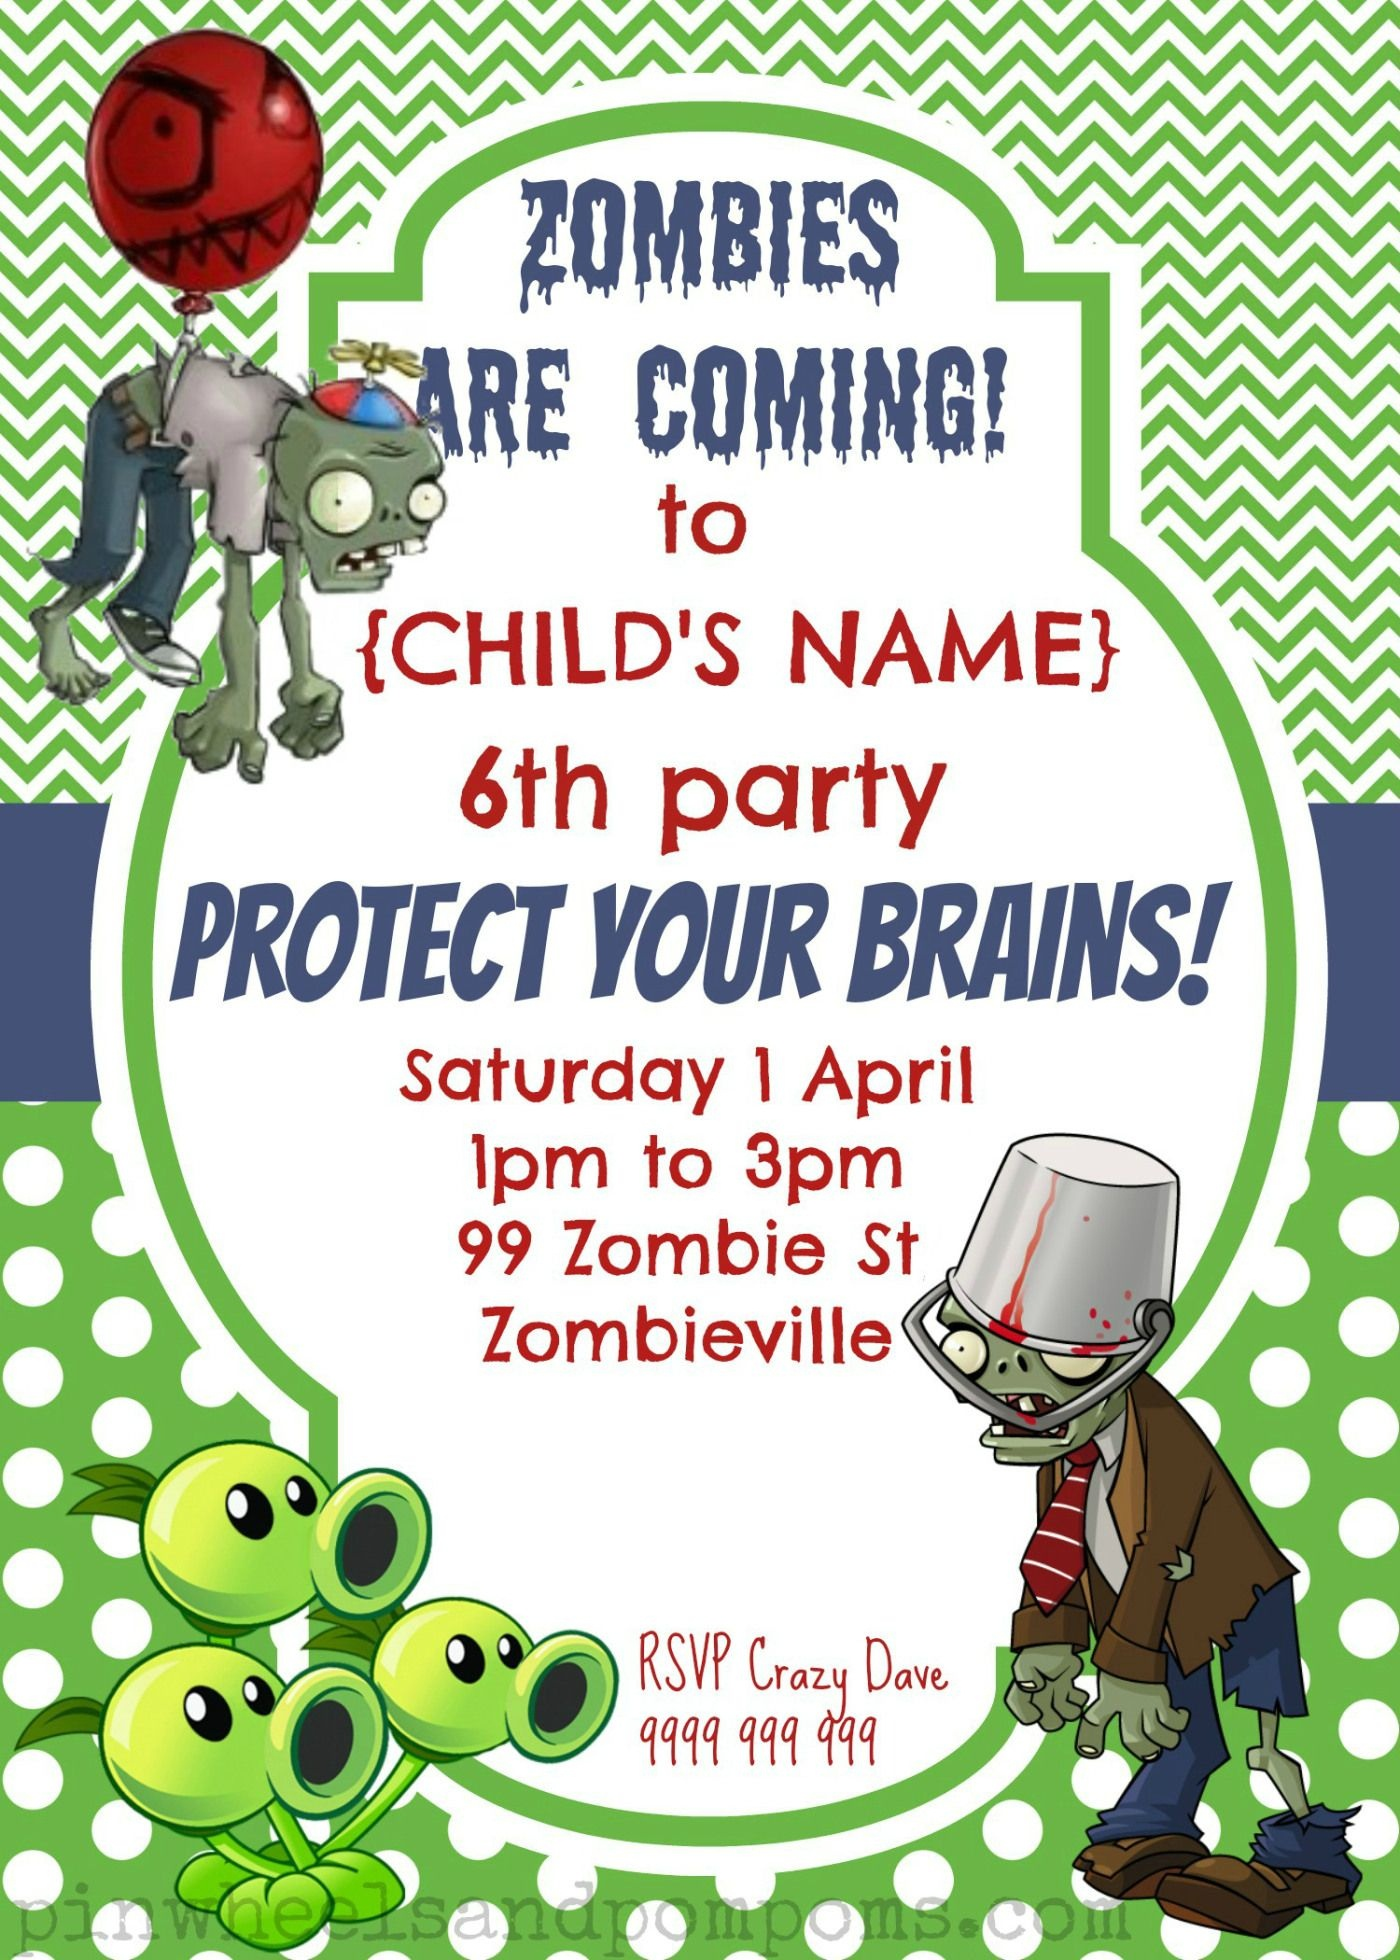 Zombie Invite Sample | Plants Vs Zombies Party Ideas | Zombie - Plants Vs Zombies Free Printable Invitations